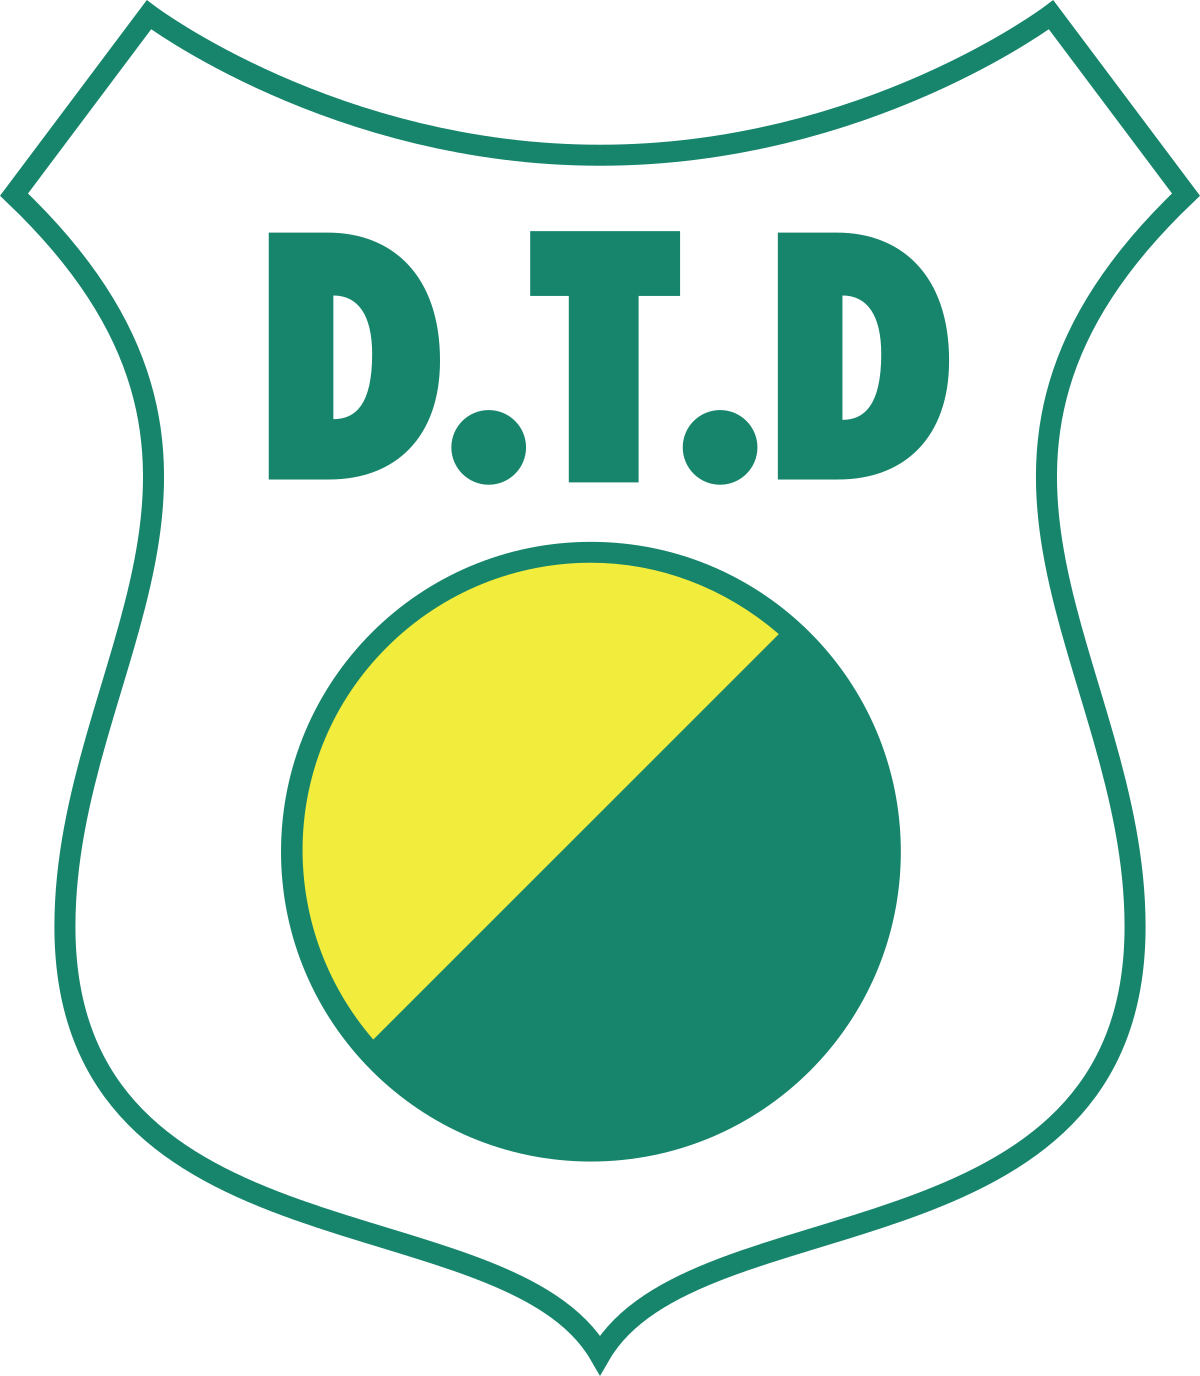 vv DTD